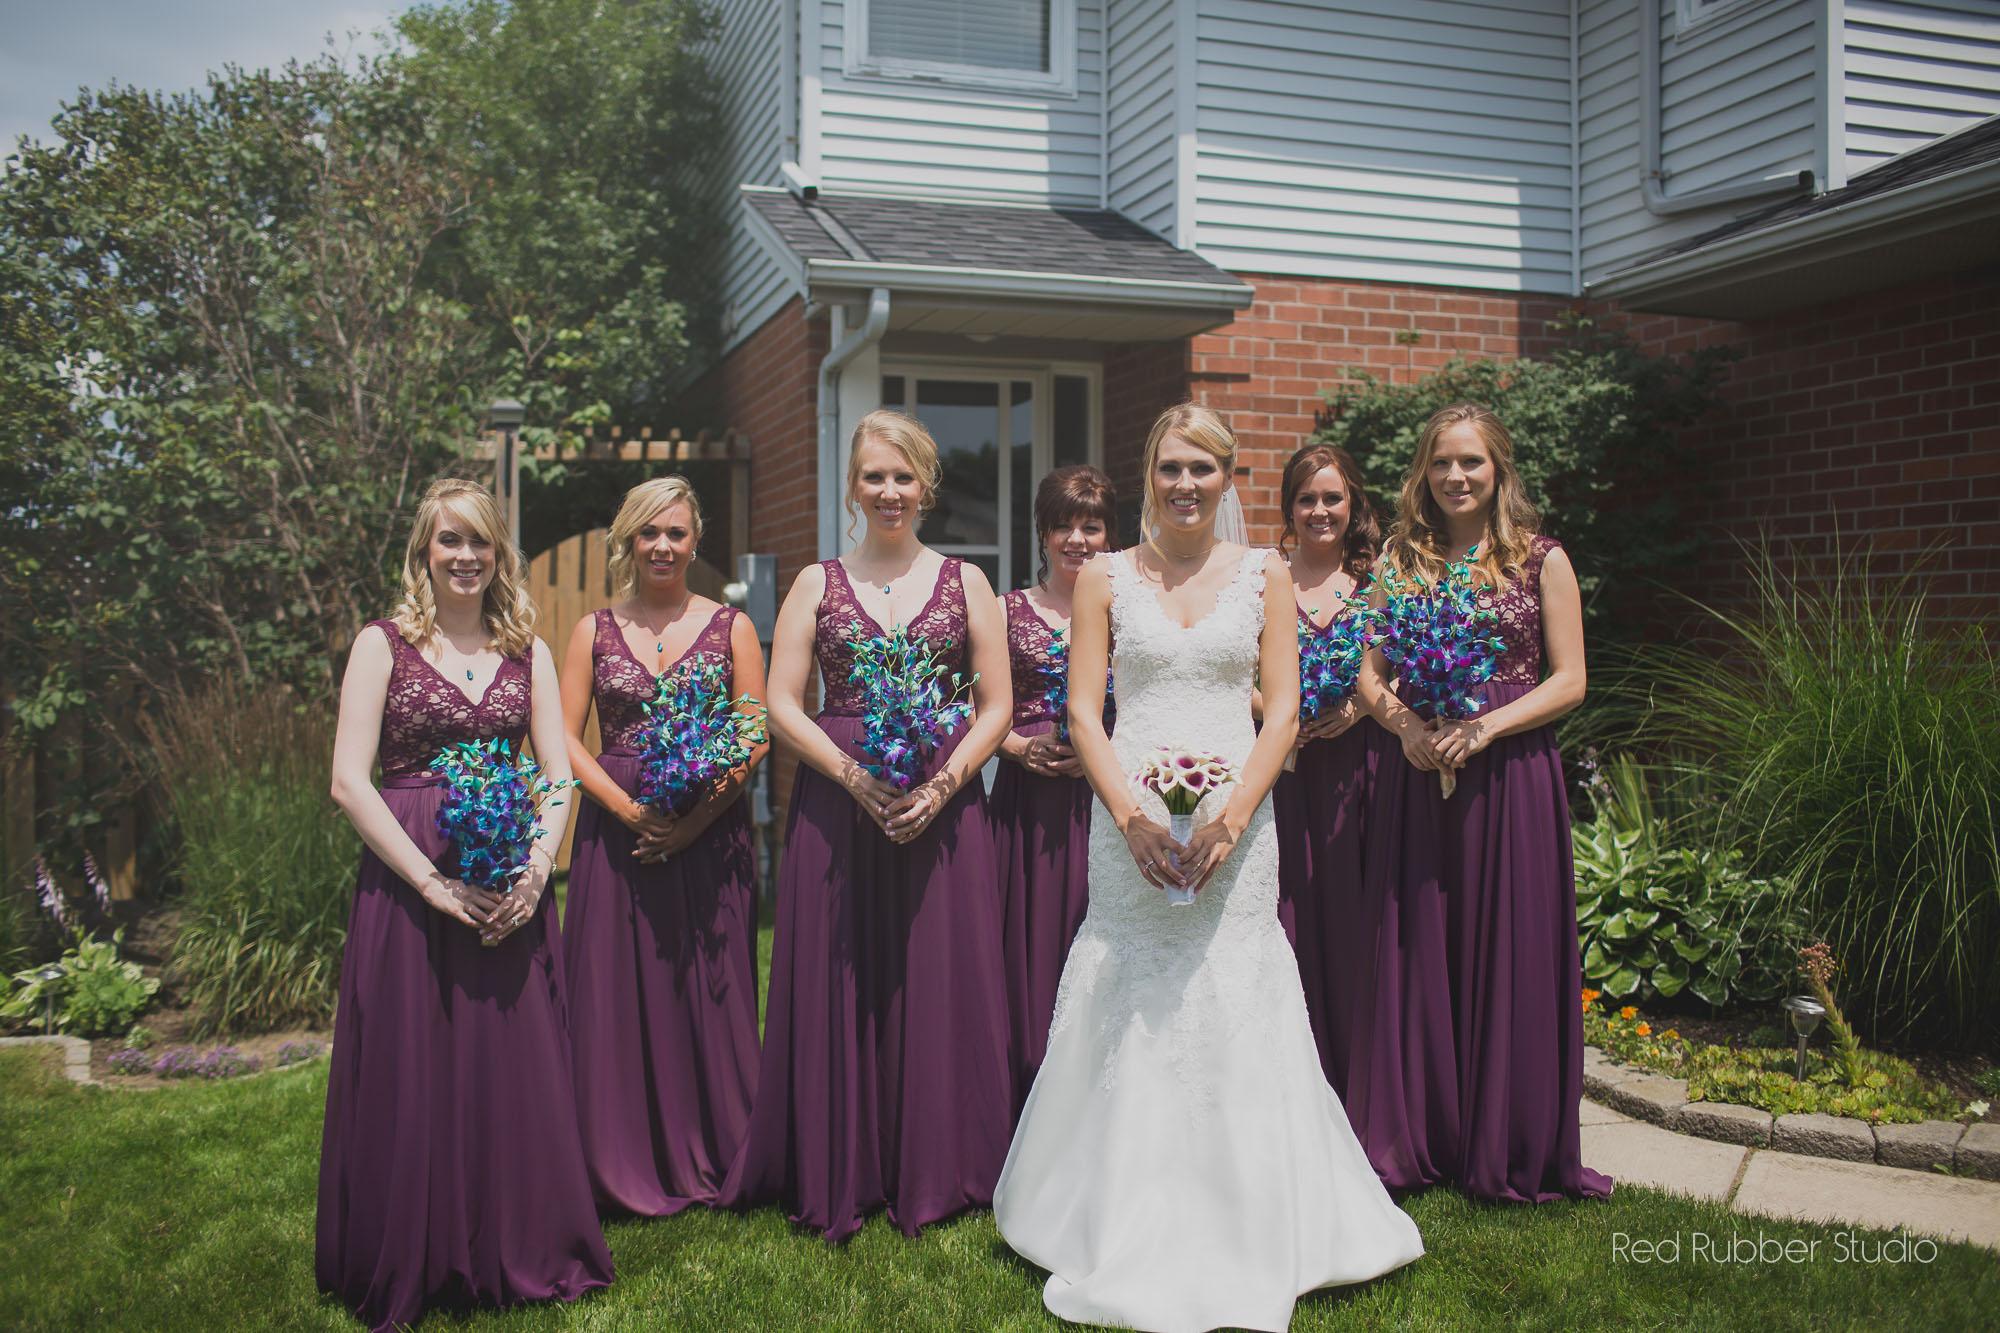 Peacock Wedding - Peacock Bridesmaid Gifts